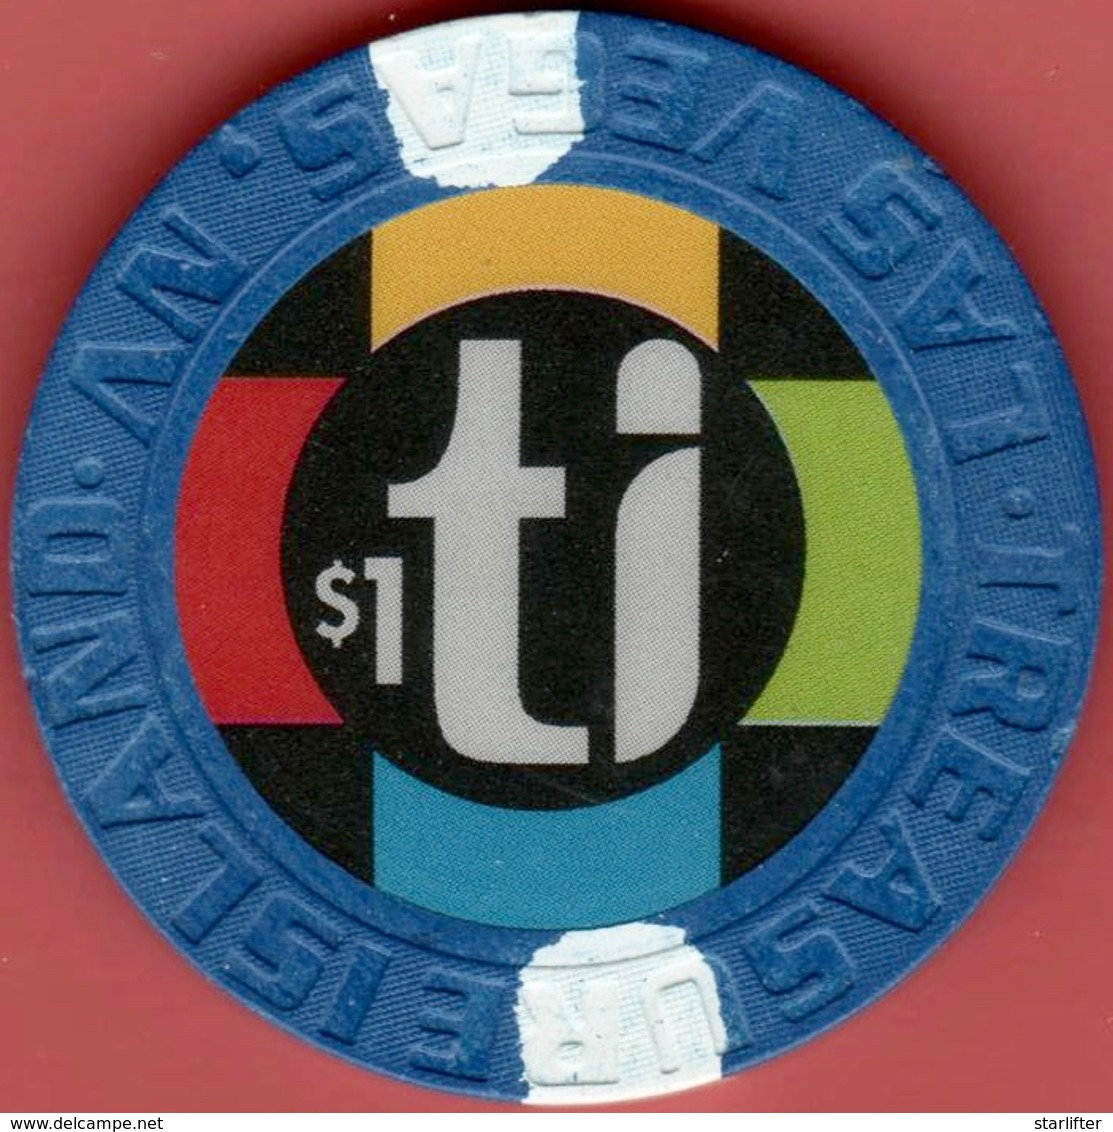 $1 Casino Chip. Treasure Island, Las Vegas, NV. I07. - Casino